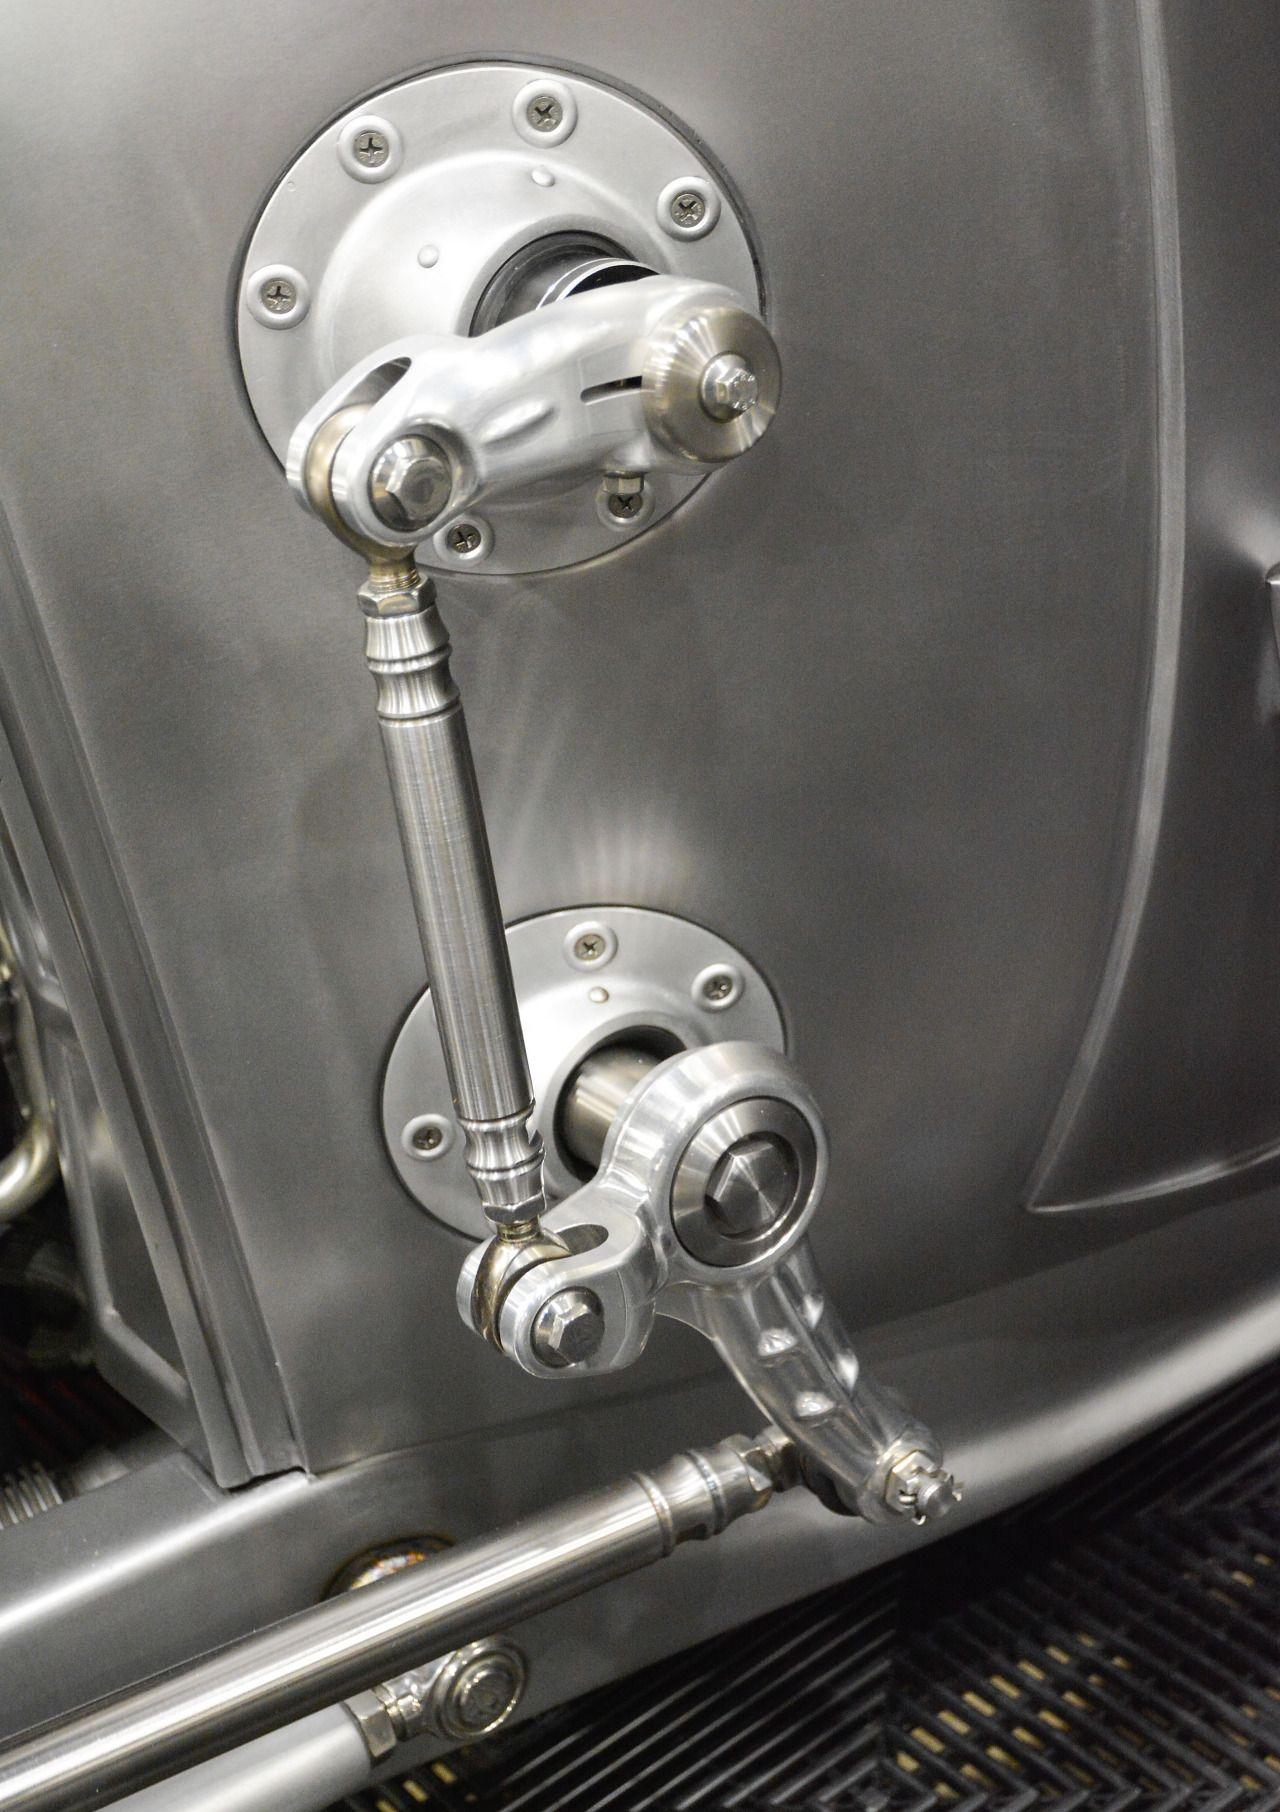 Tumblr Oktfy5lz8x1vw11heo4 1280 Jpg 1280 1812 Custom Metal Fabrication Metal Fabrication Metal Fab